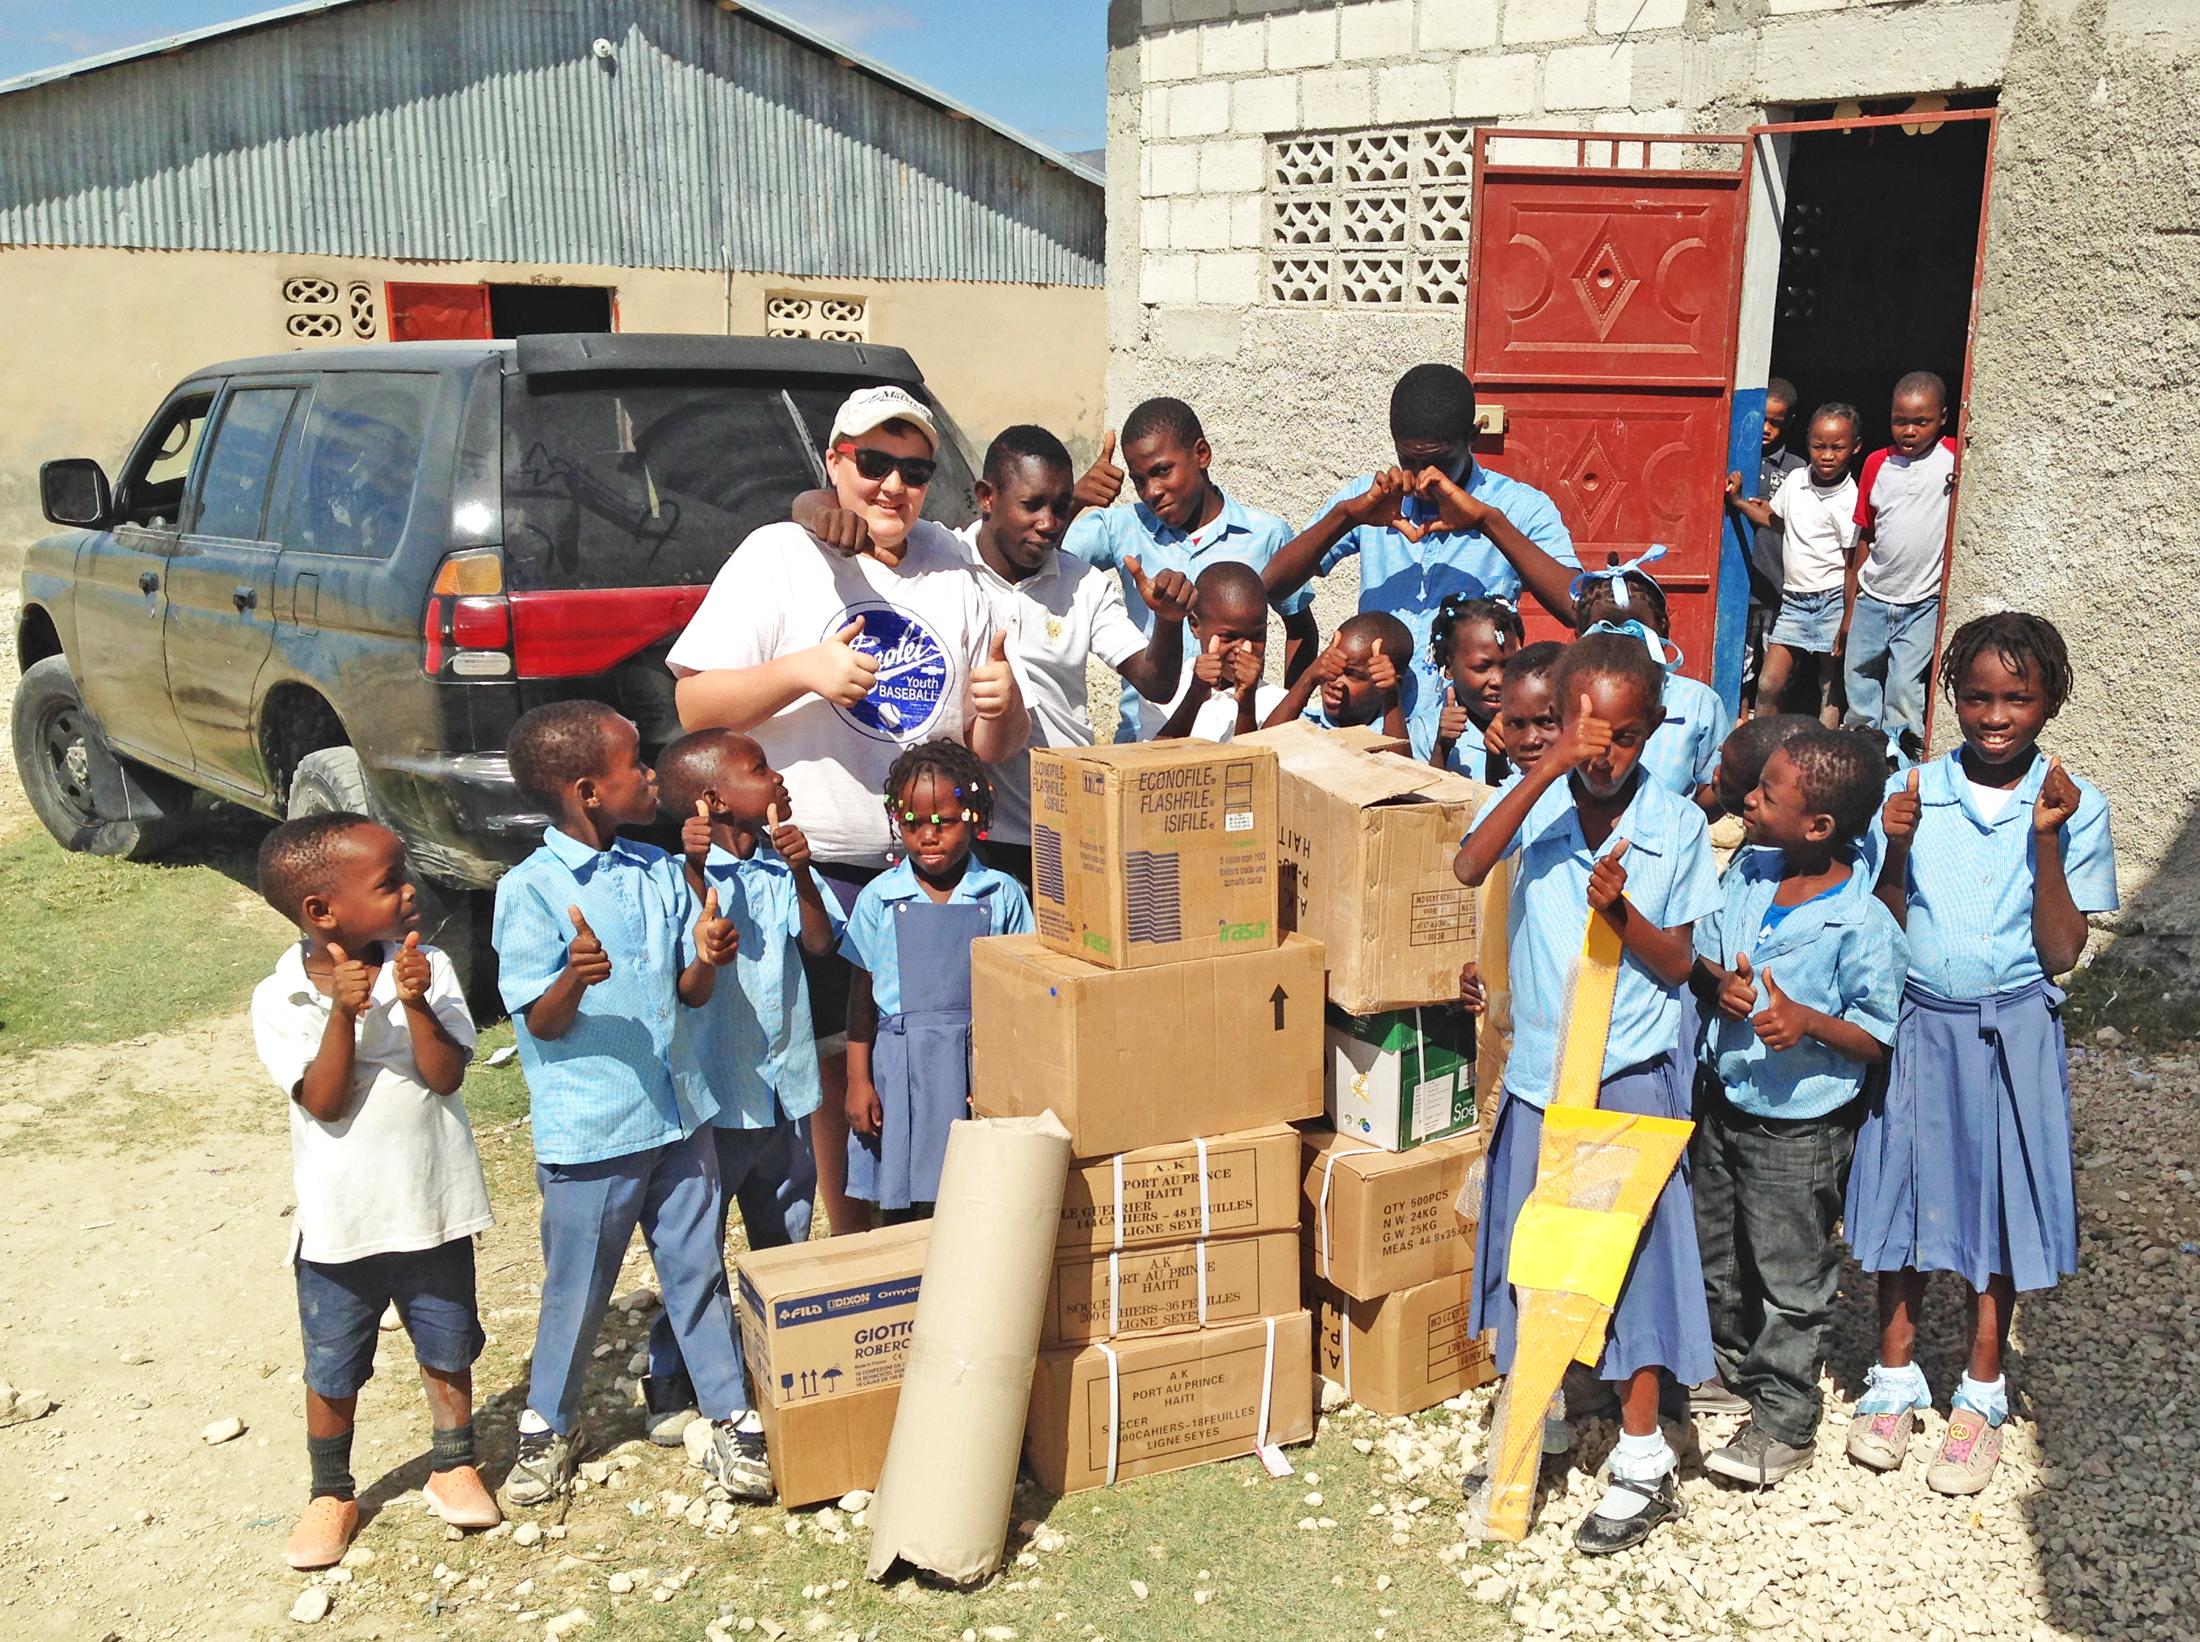 Student raises $2,000 for school supplies in Haiti